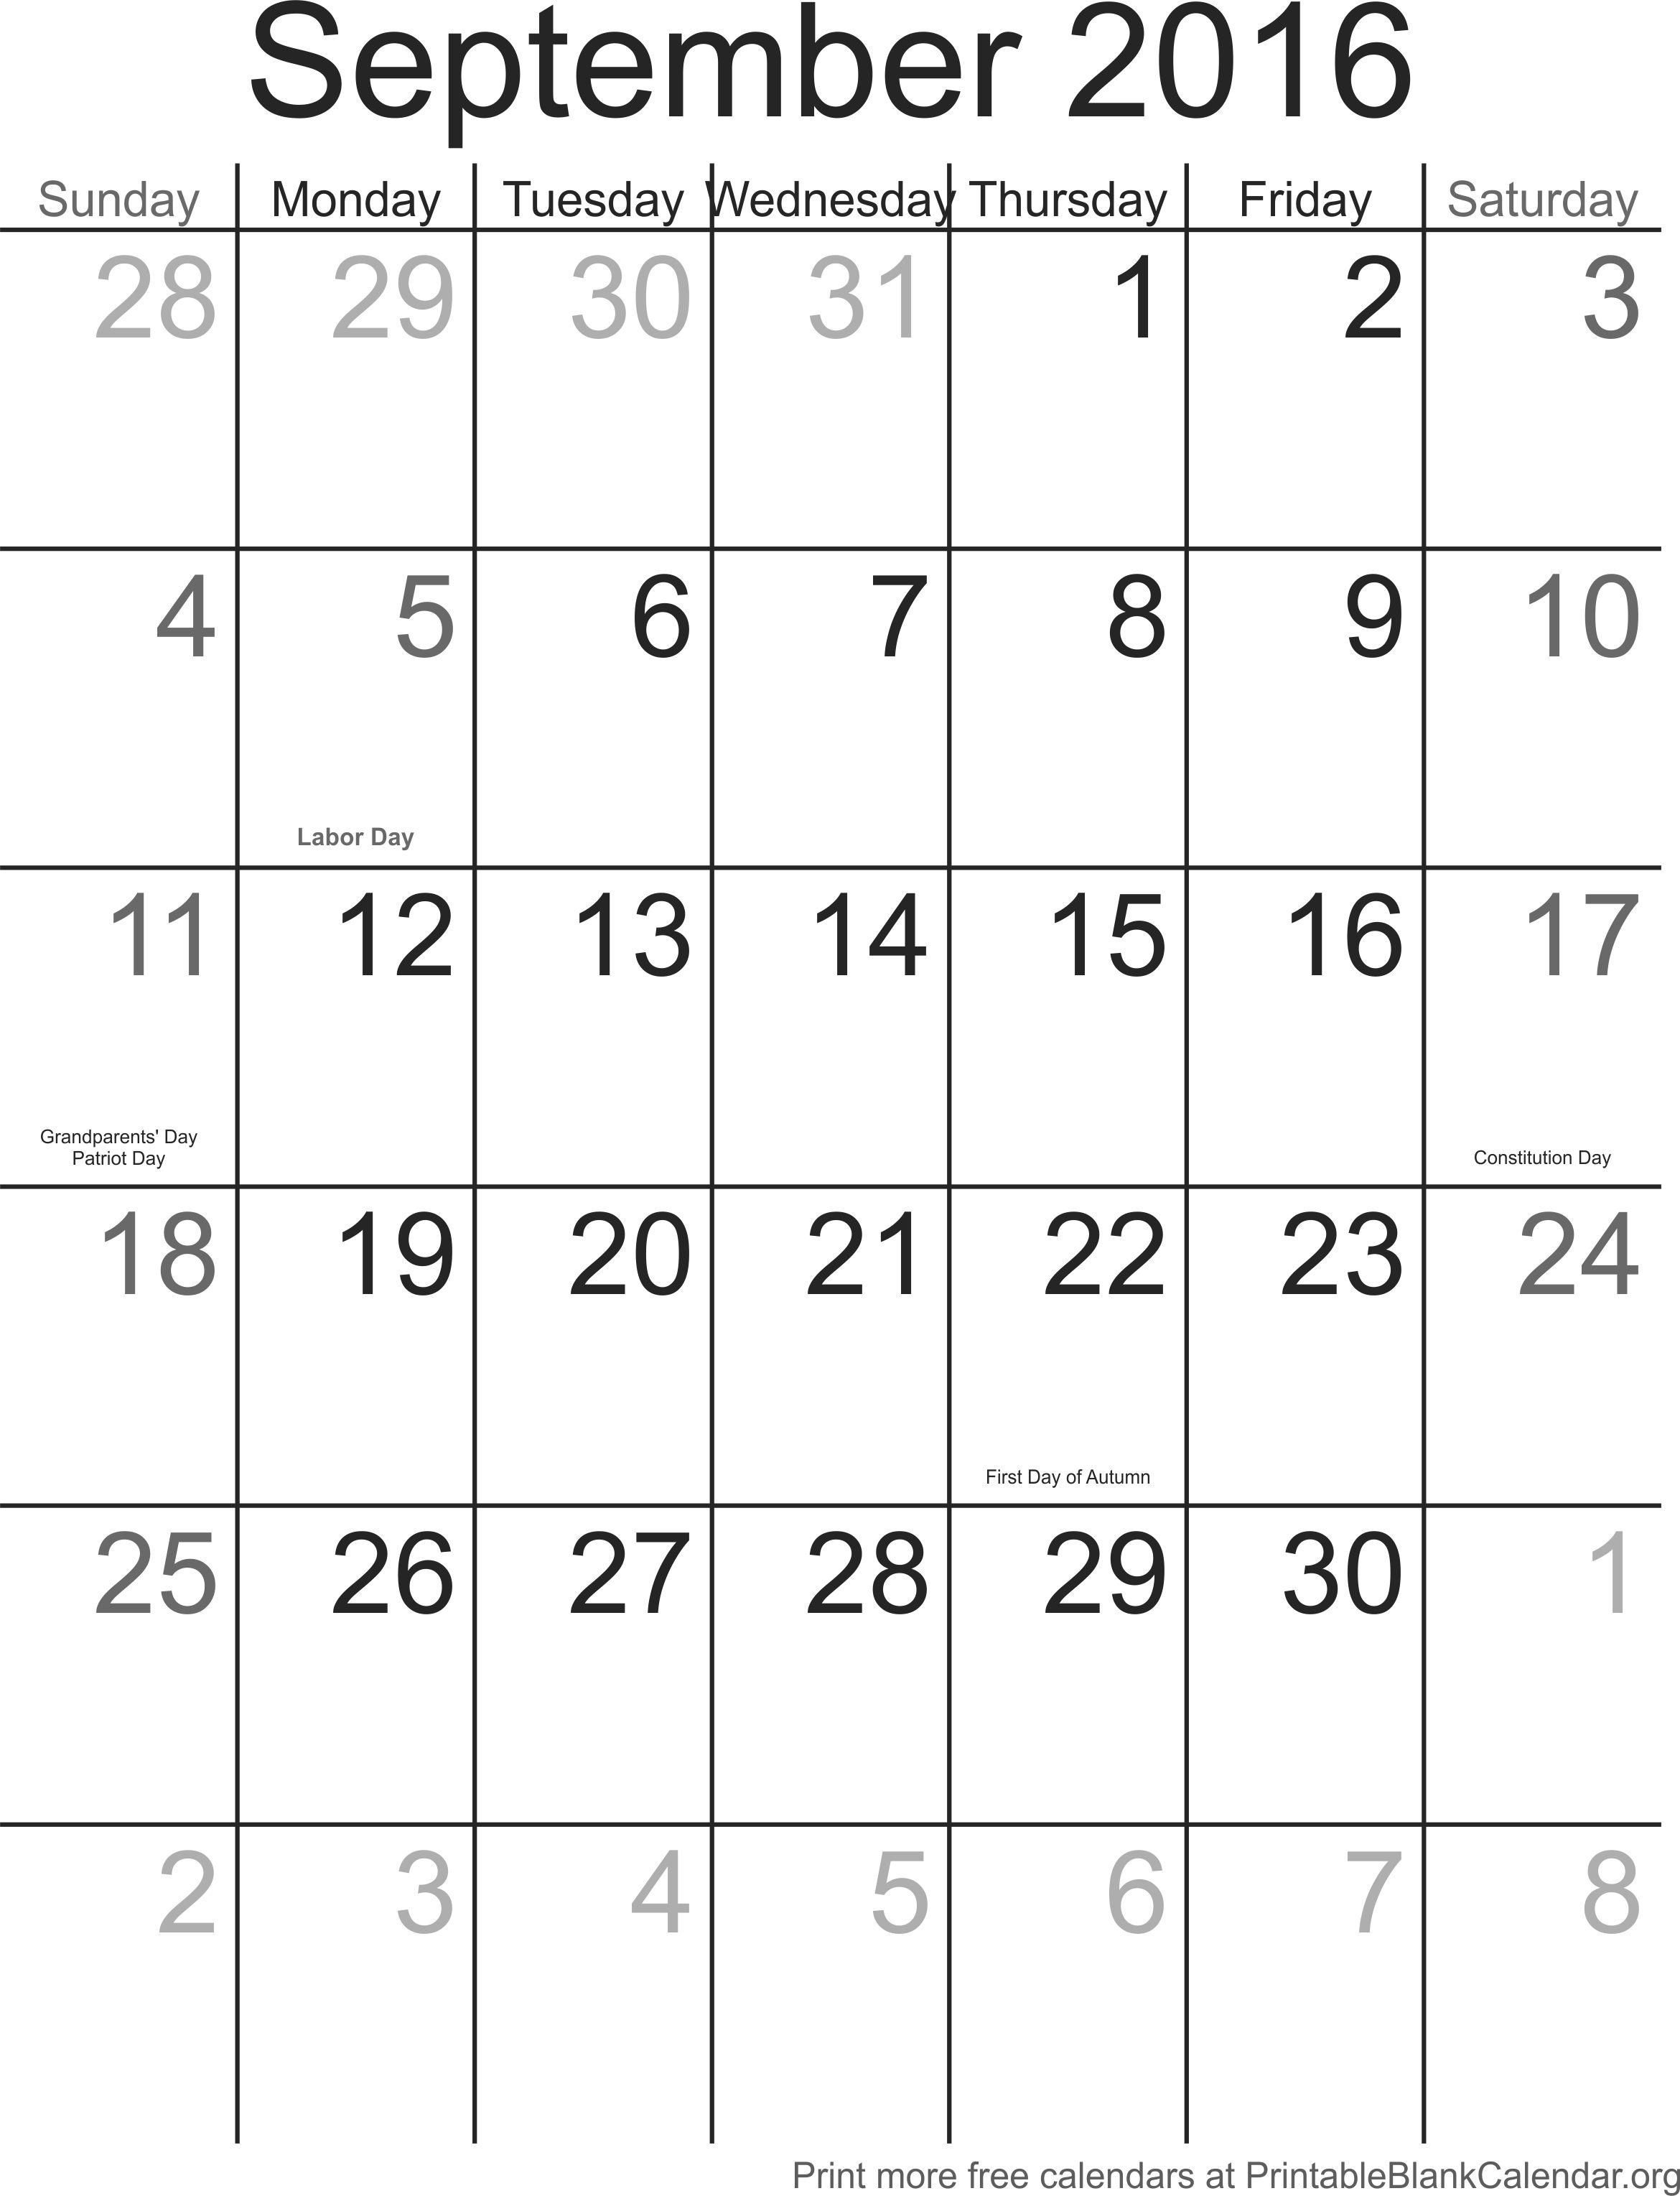 September Calendar 2016 With Holidays : September calendar with holidays printable blank